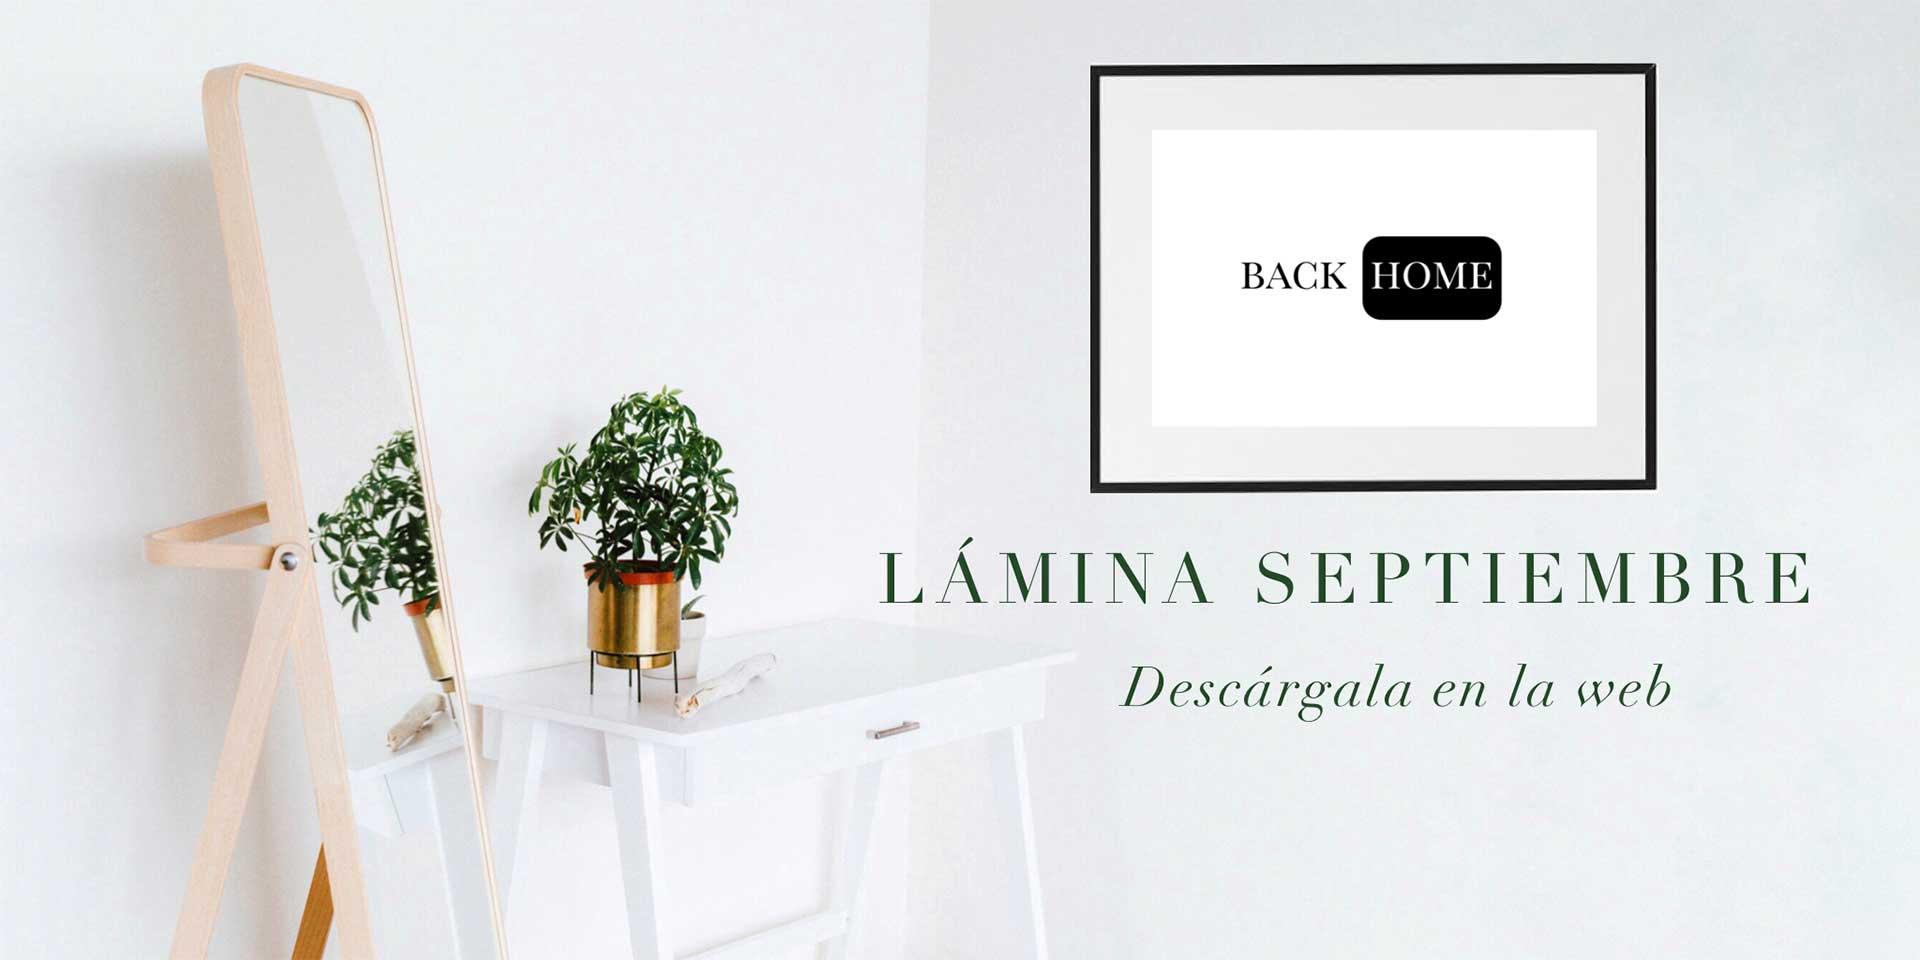 Lámina Decorativa Gratis Septiembre